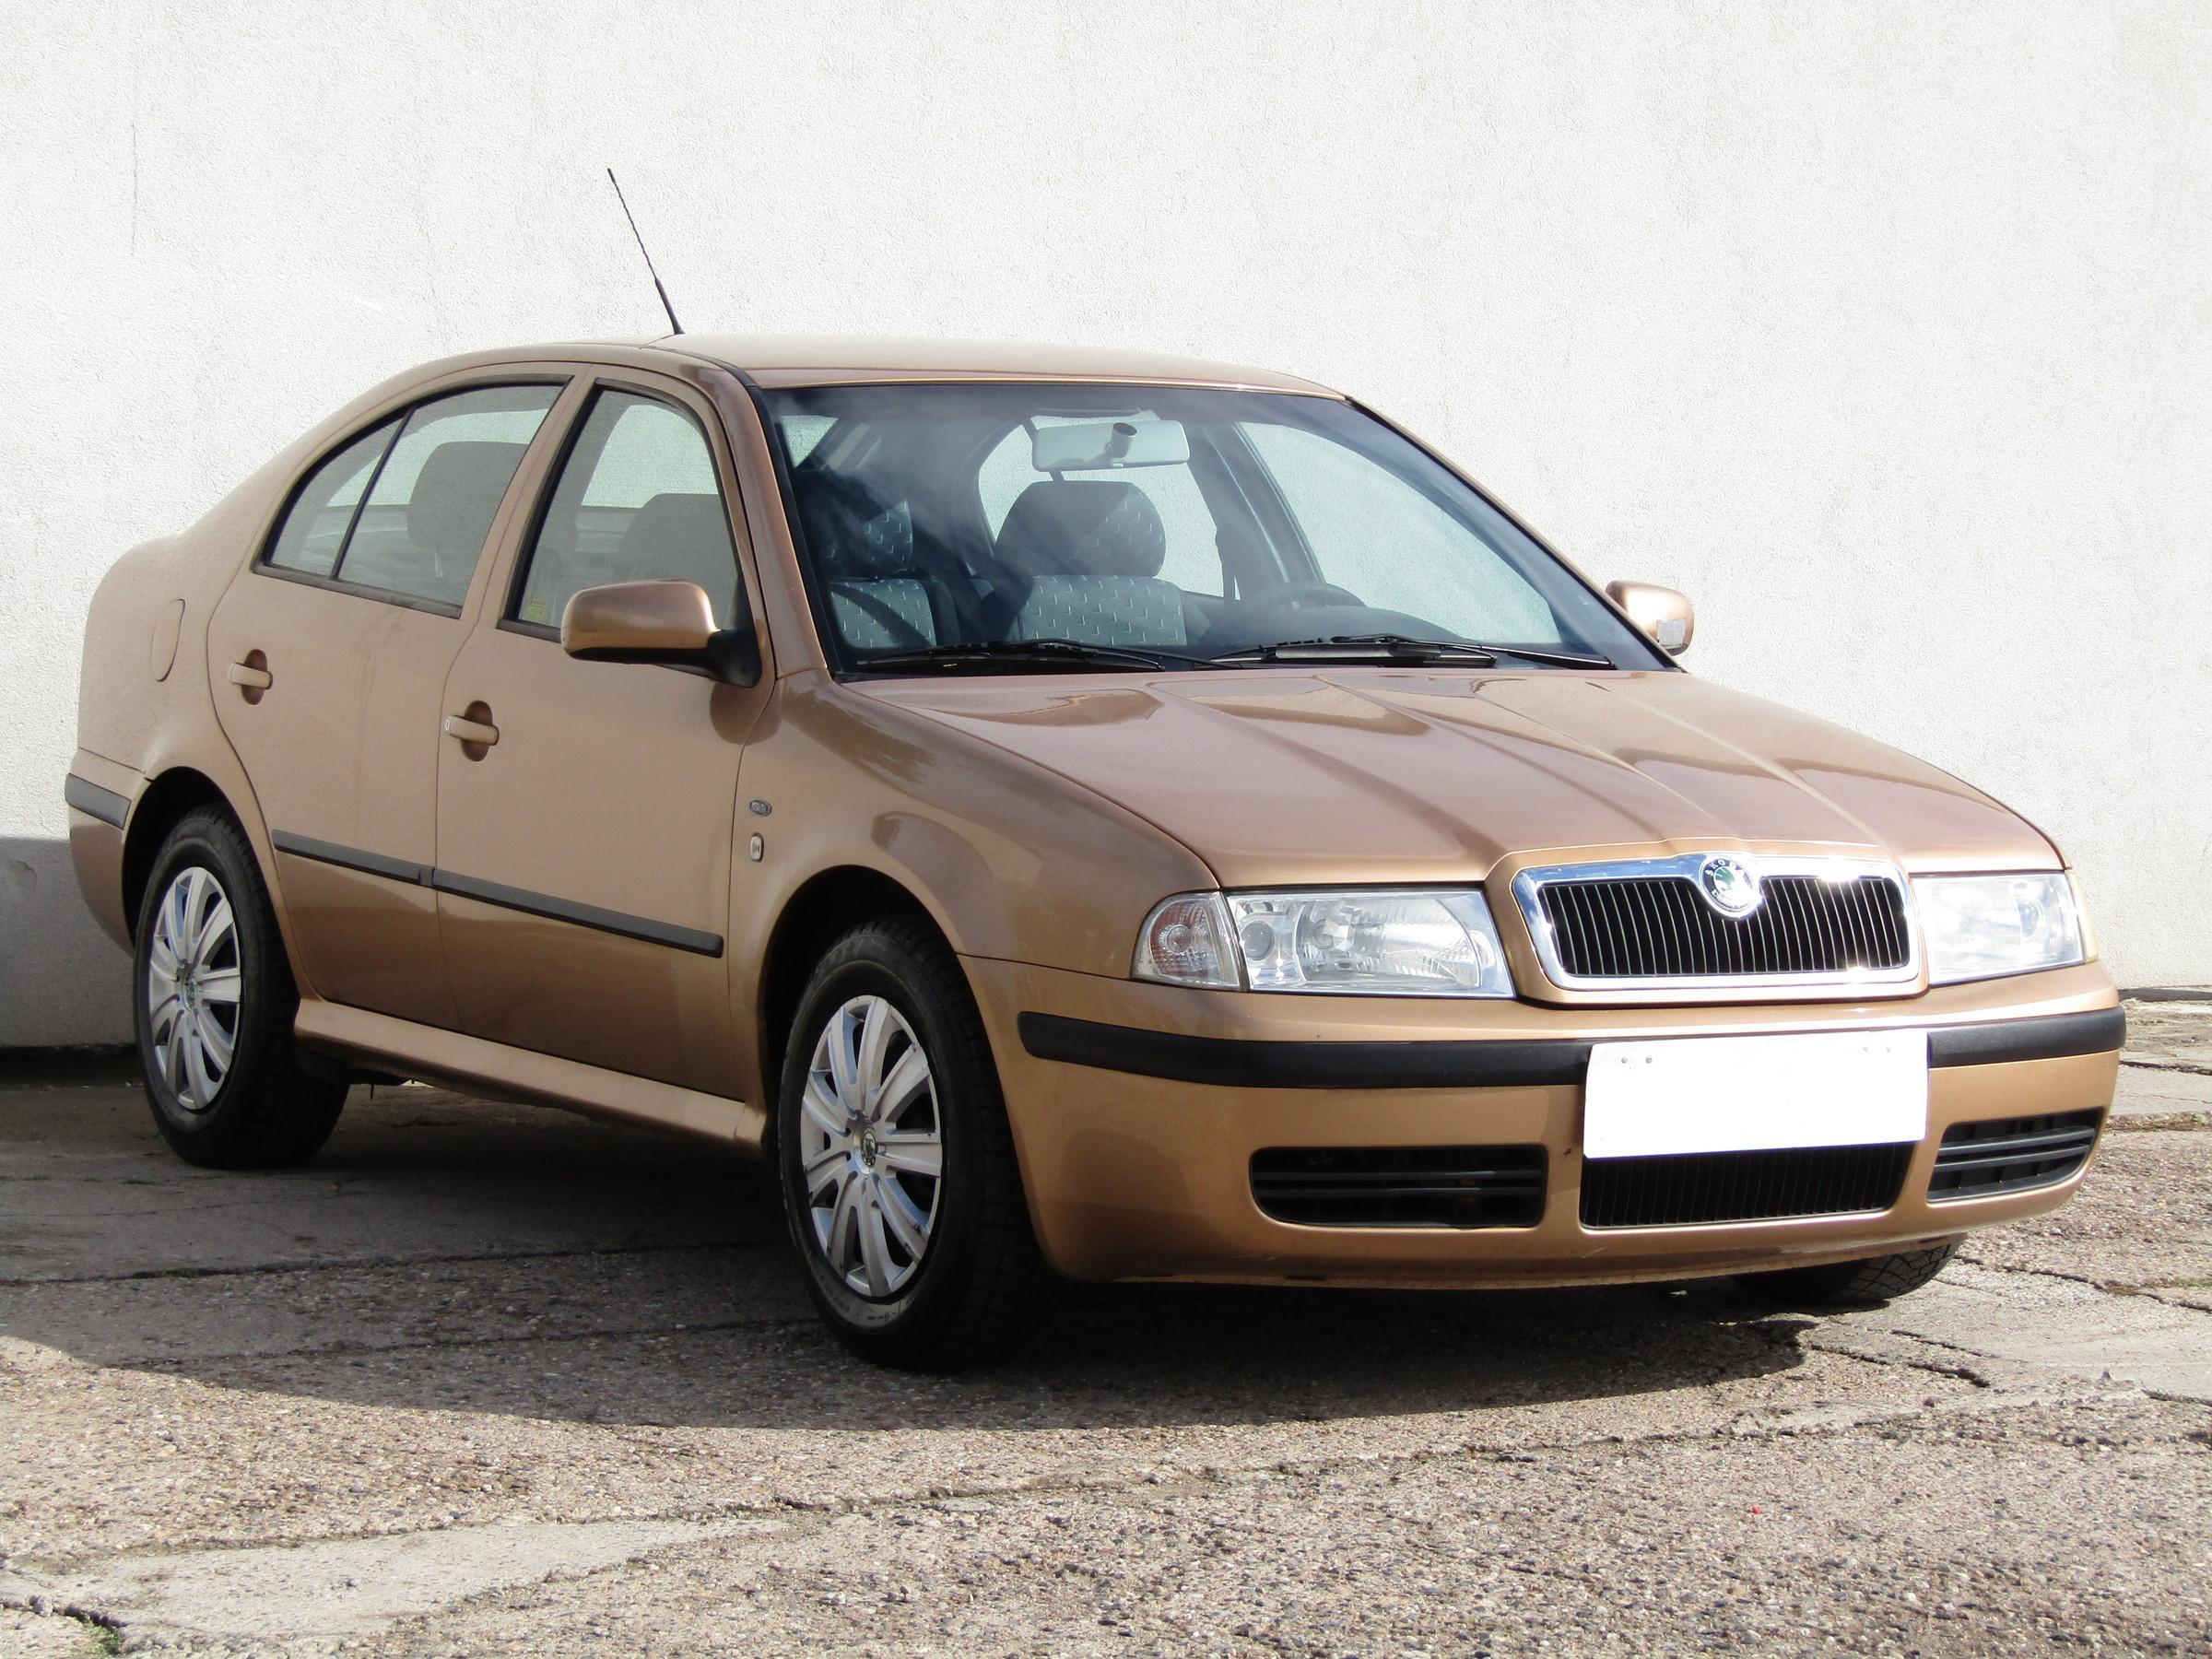 Škoda Octavia 1.9 TDi Ambiente